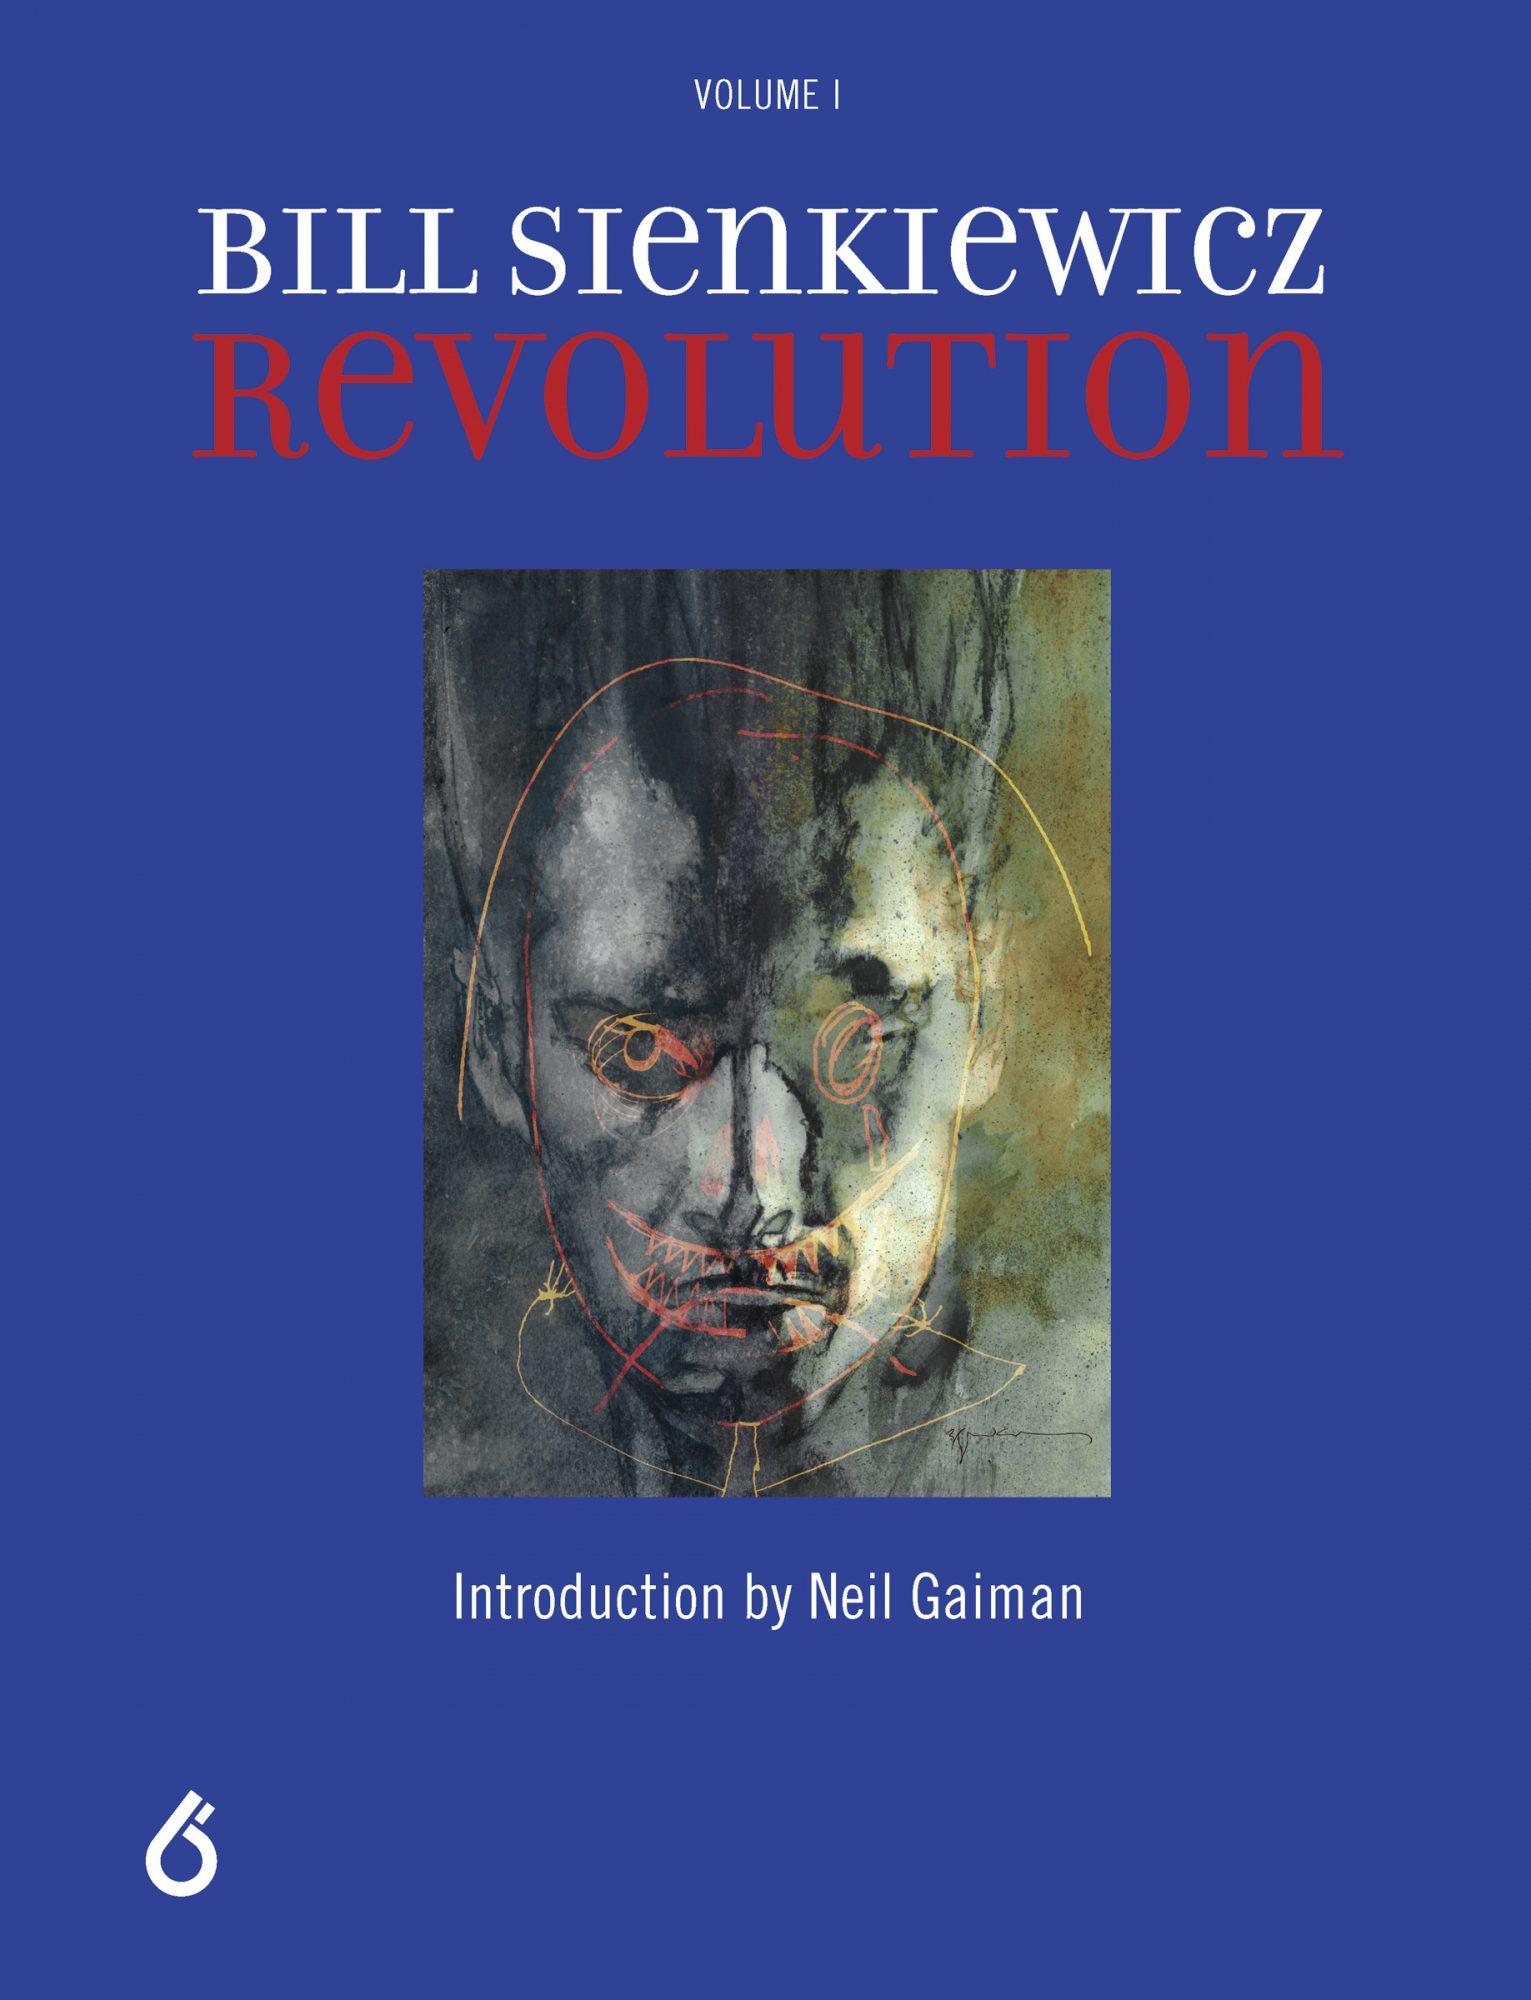 Bill Sienkiewicz: Revolution